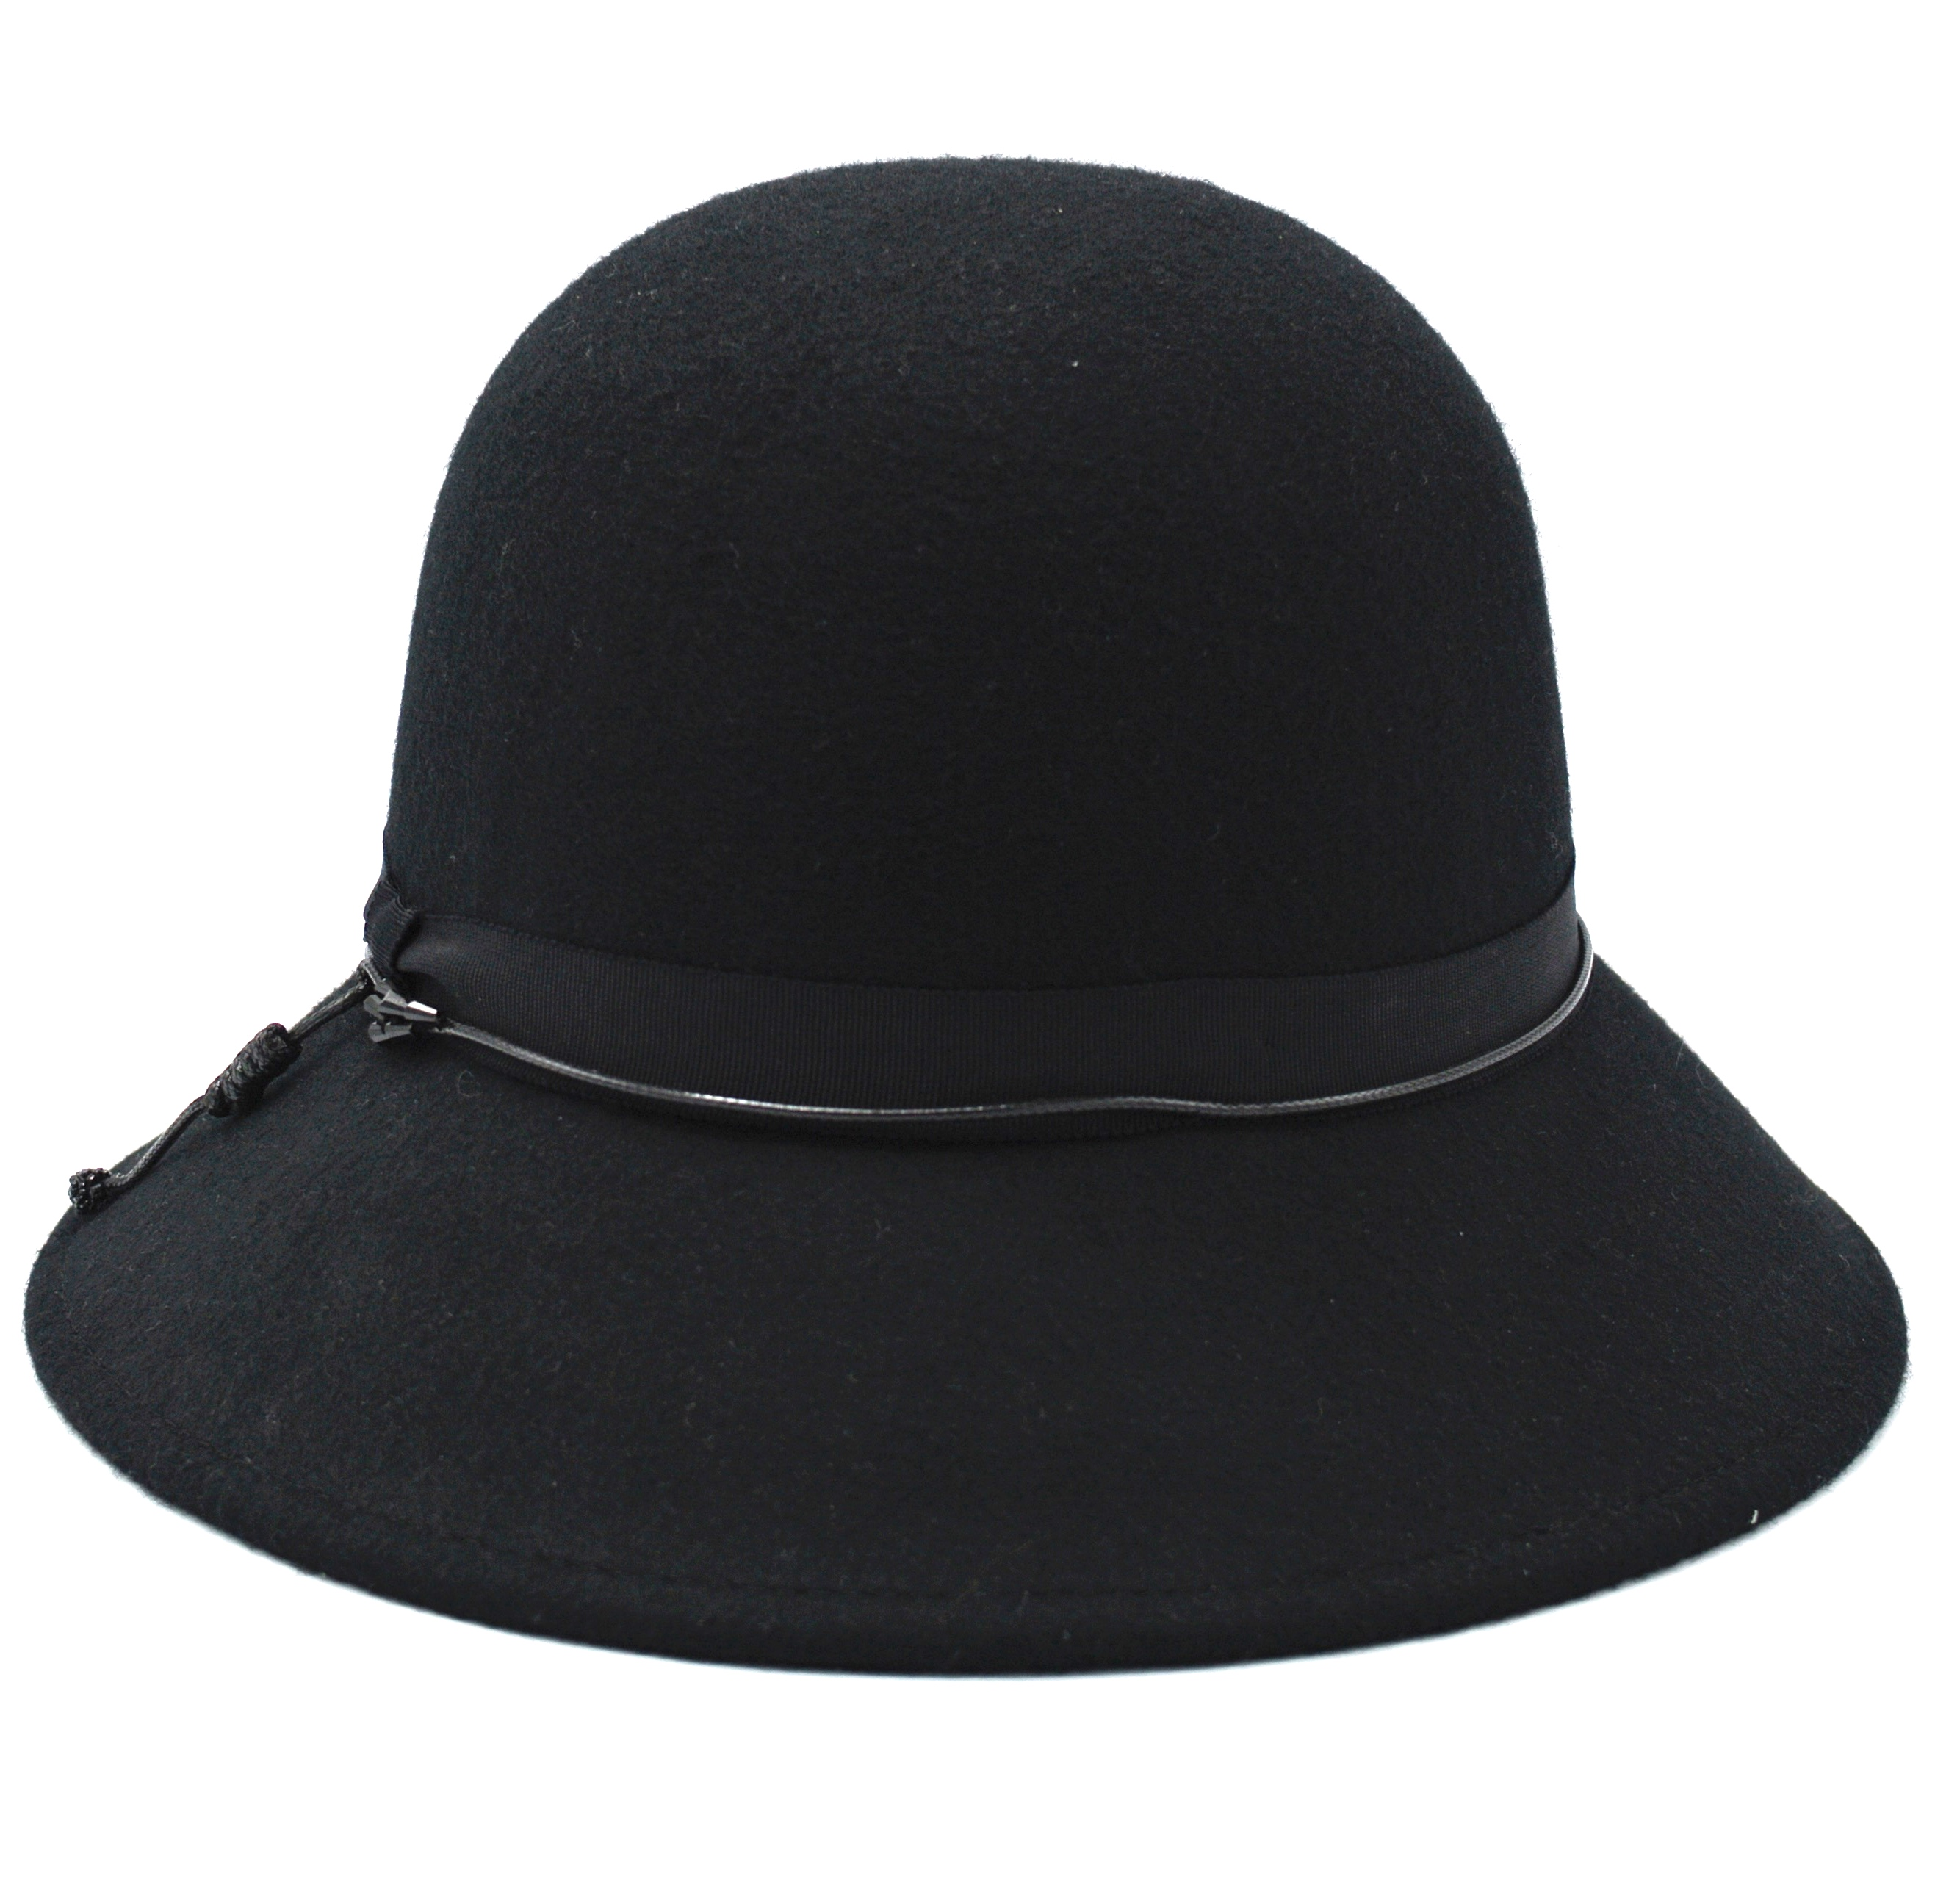 Loevenich Clochehatt Black